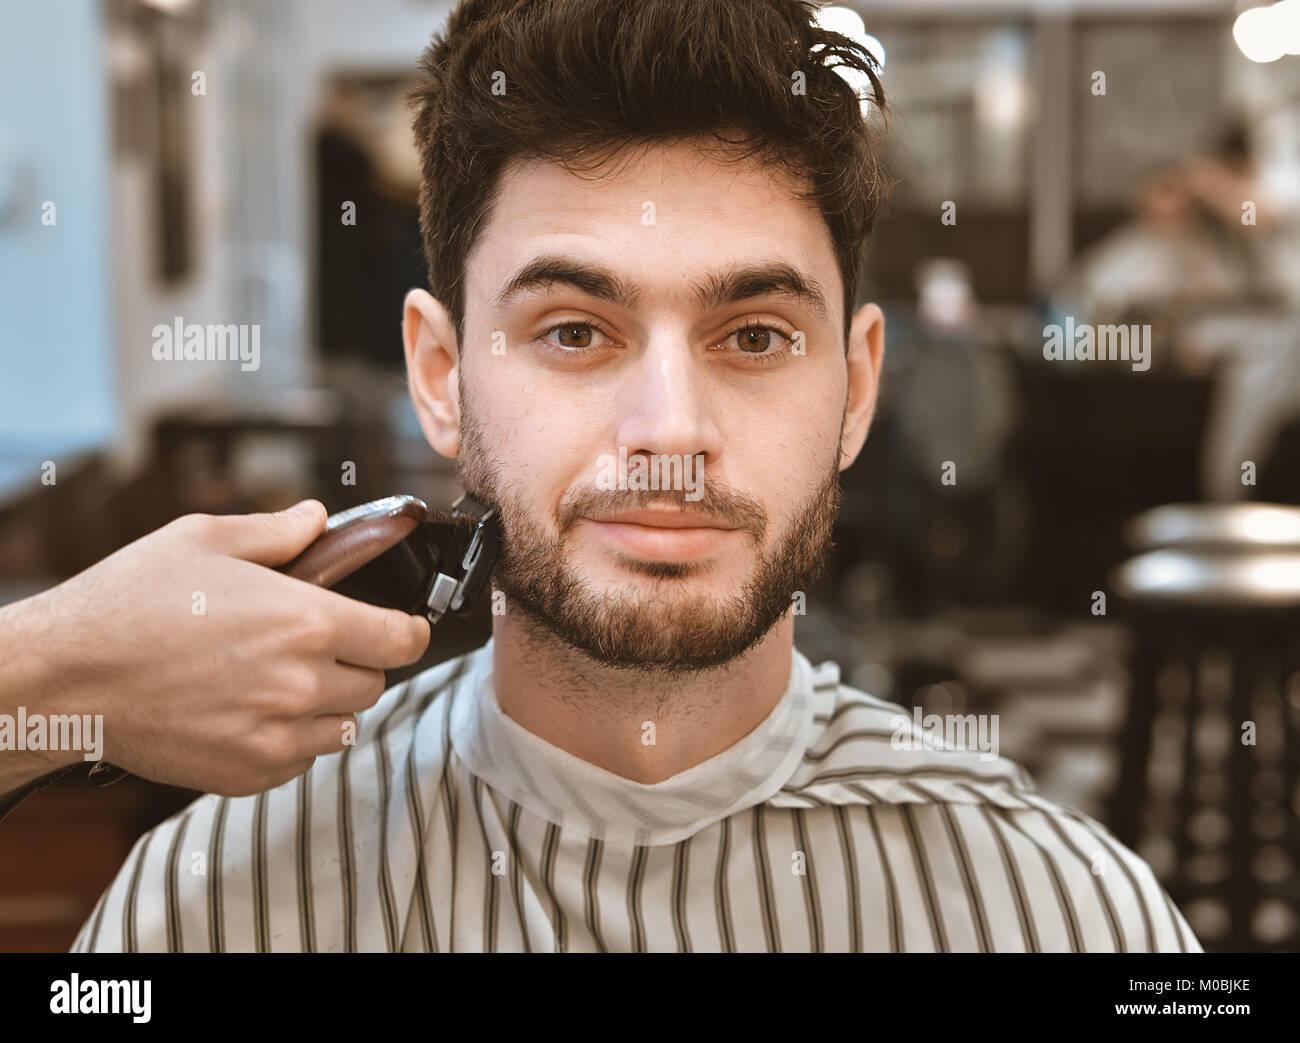 Stylish Haircut Men Stock Photos Stylish Haircut Men Stock Images